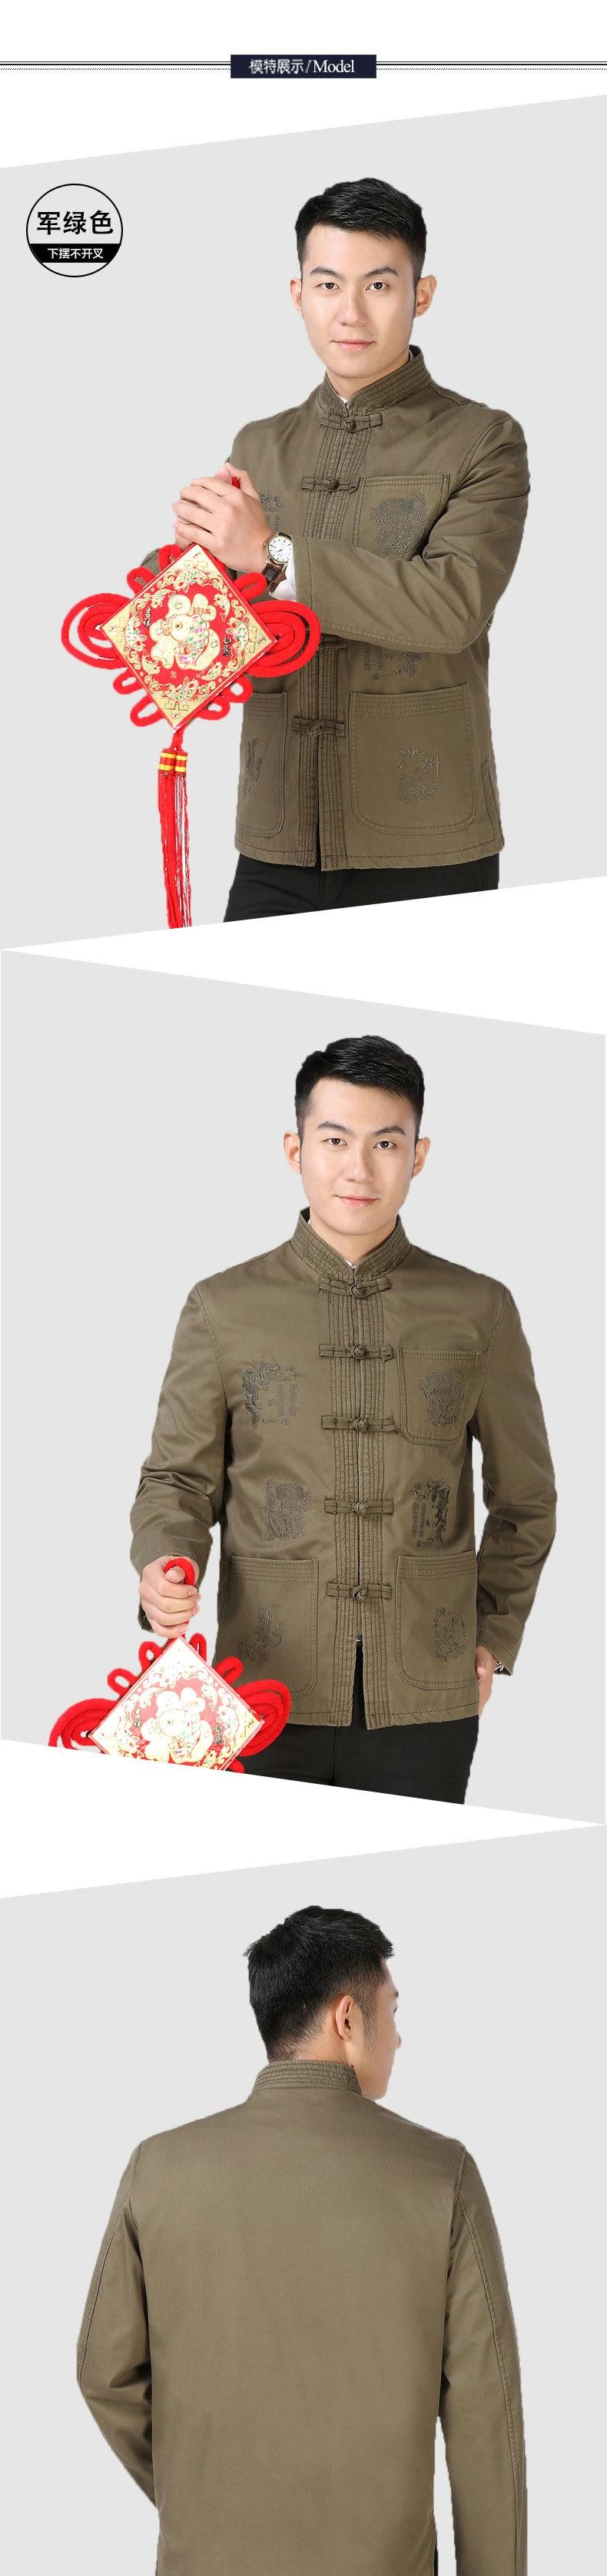 WAEOLSA Men Chinese Blazer Tunic Suit Coat Mandarin Collar Blazers Man Embroidery Tangzhuang Jacket Oriental Mao Suit Male Ethnical Blazer (4)